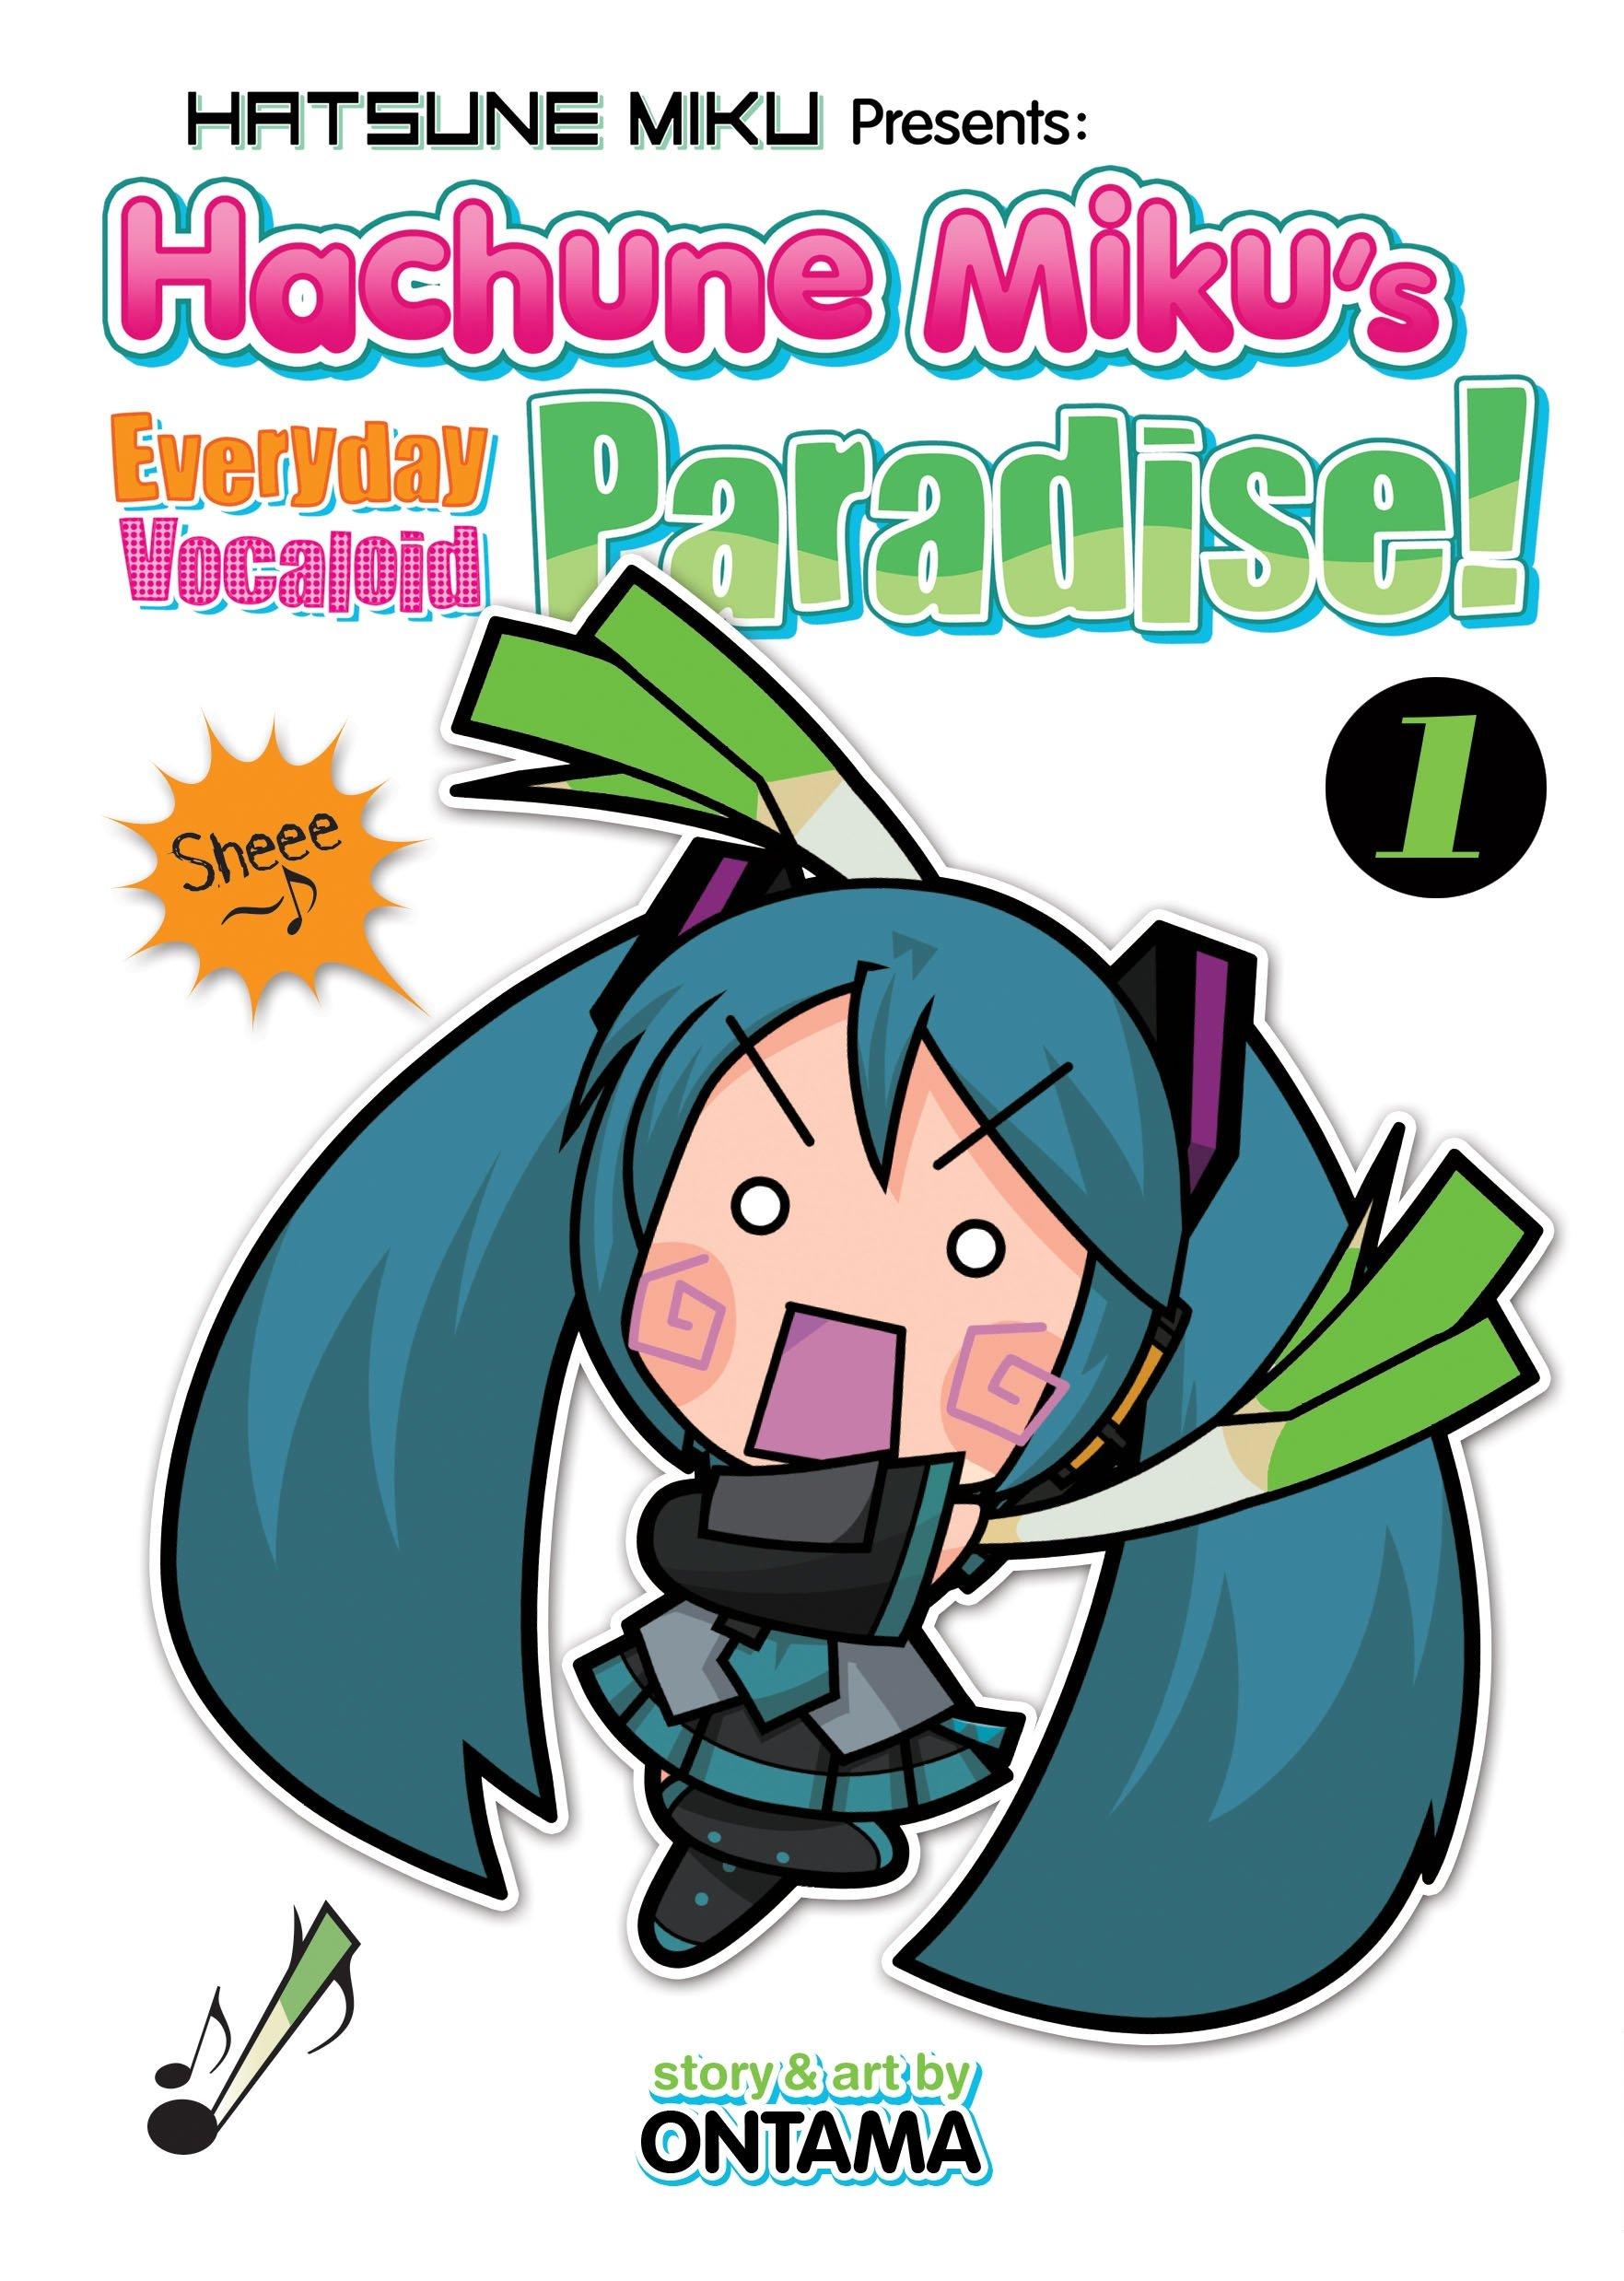 Hatsune Miku Presents: Hachune Miku's Everyday Vocaloid